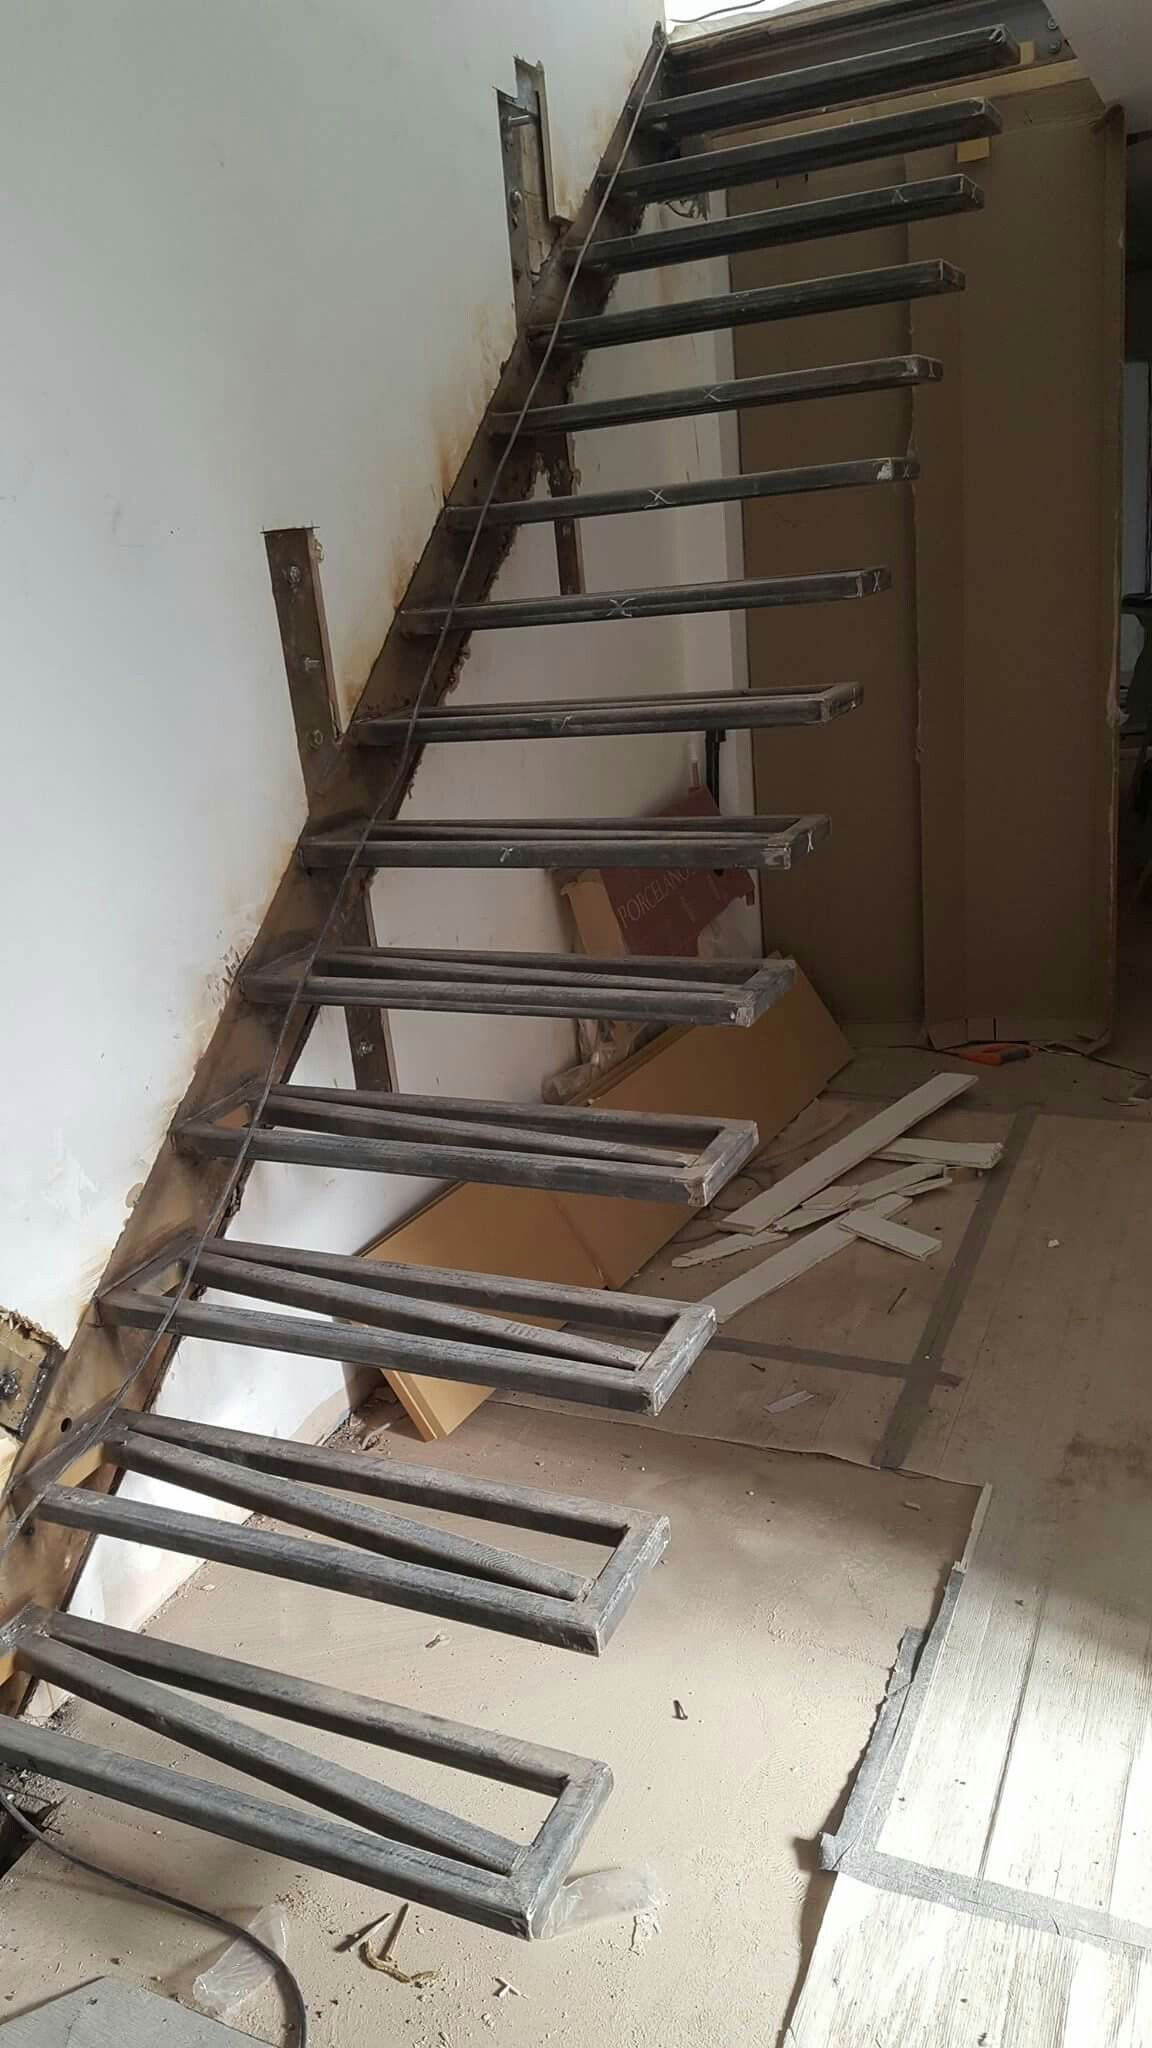 Pin De L U X U R Y Connoisseur En Staircases Escaleras De | Portable Stairs With Handrail | Chair | Plastic Portable | Camper | Wall Mounted | Ladder